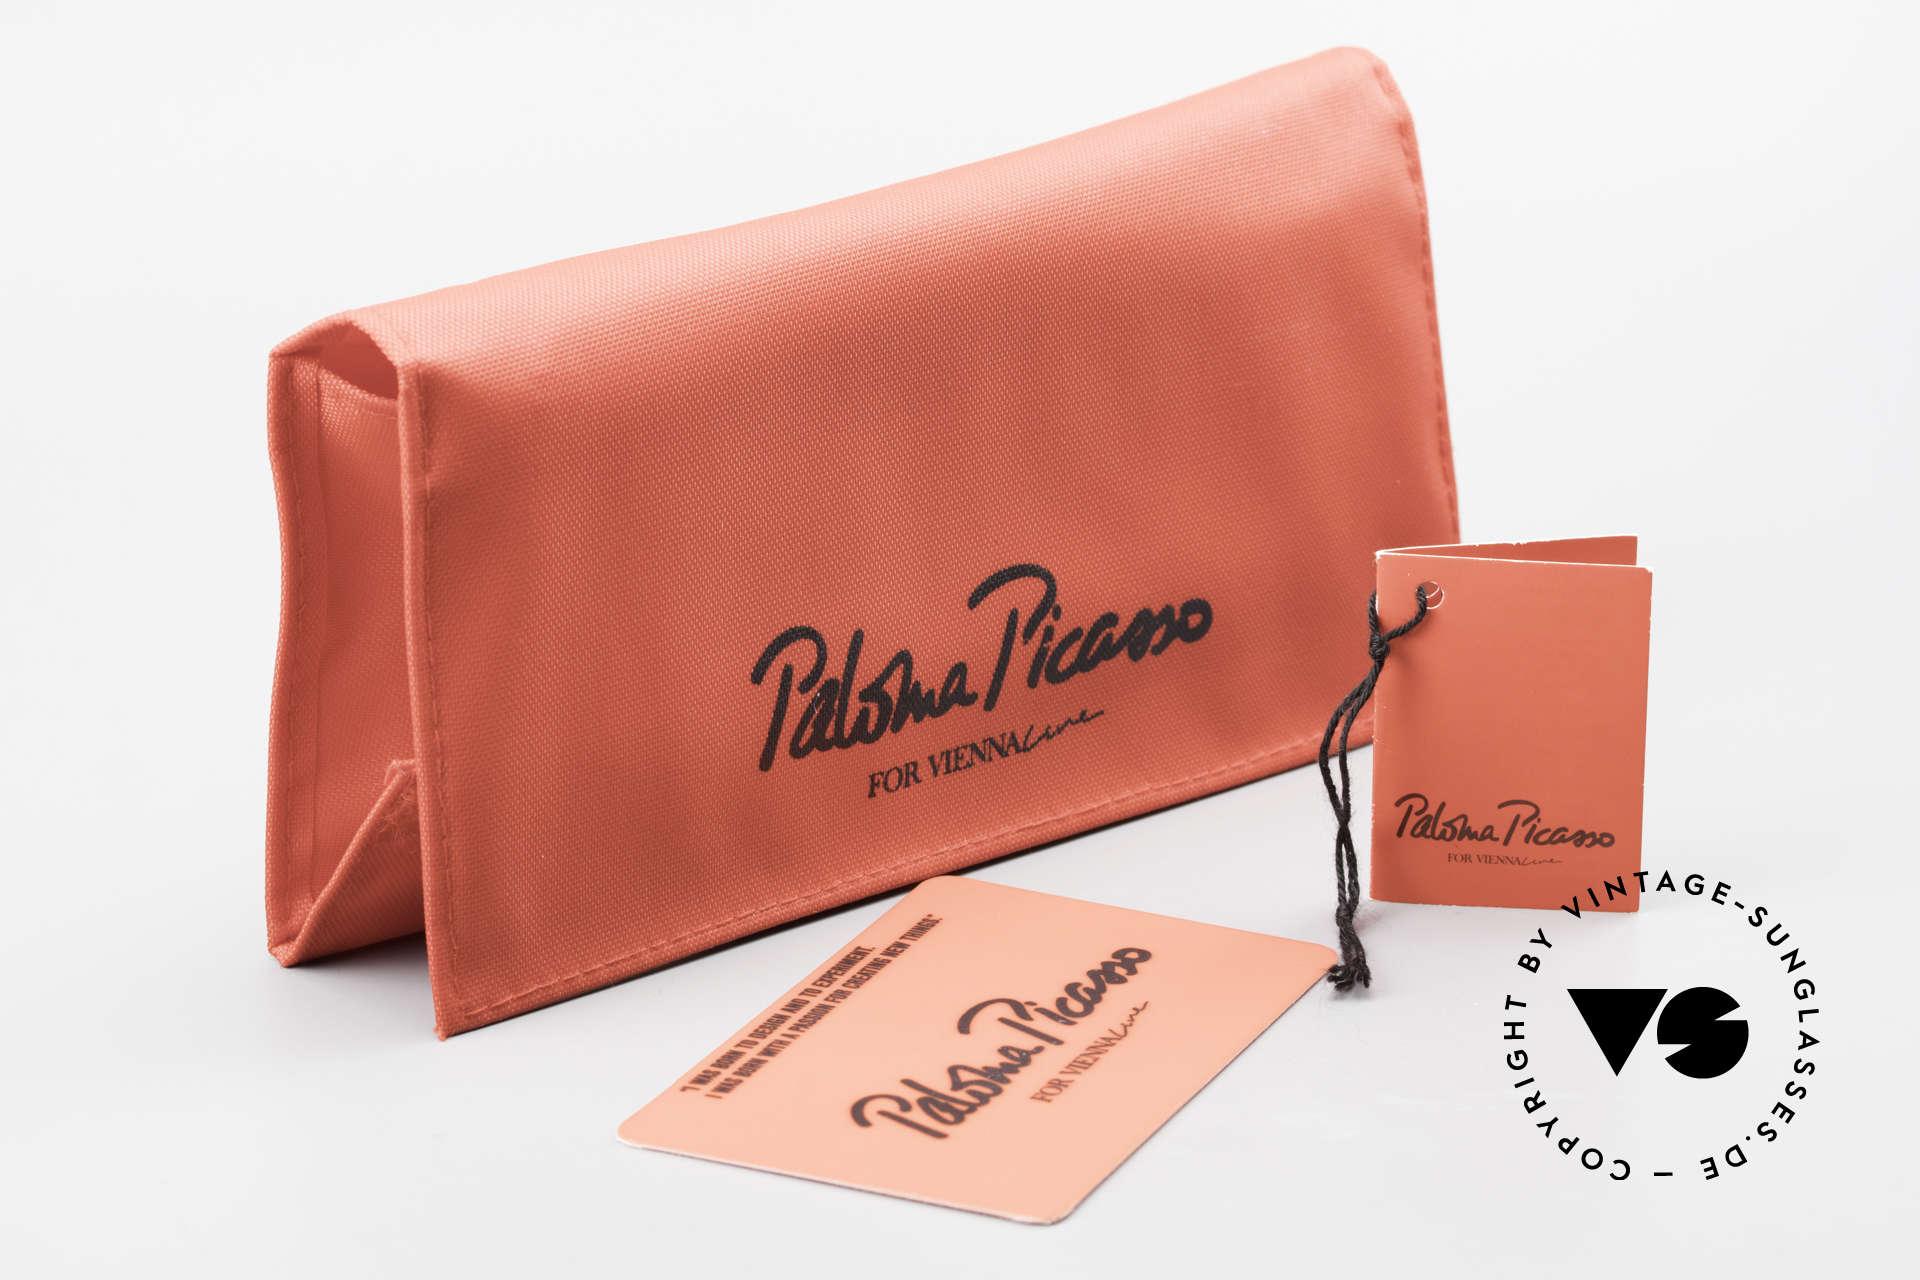 Paloma Picasso 3707 90s Ladies Shades Rhinestones, Size: medium, Made for Women